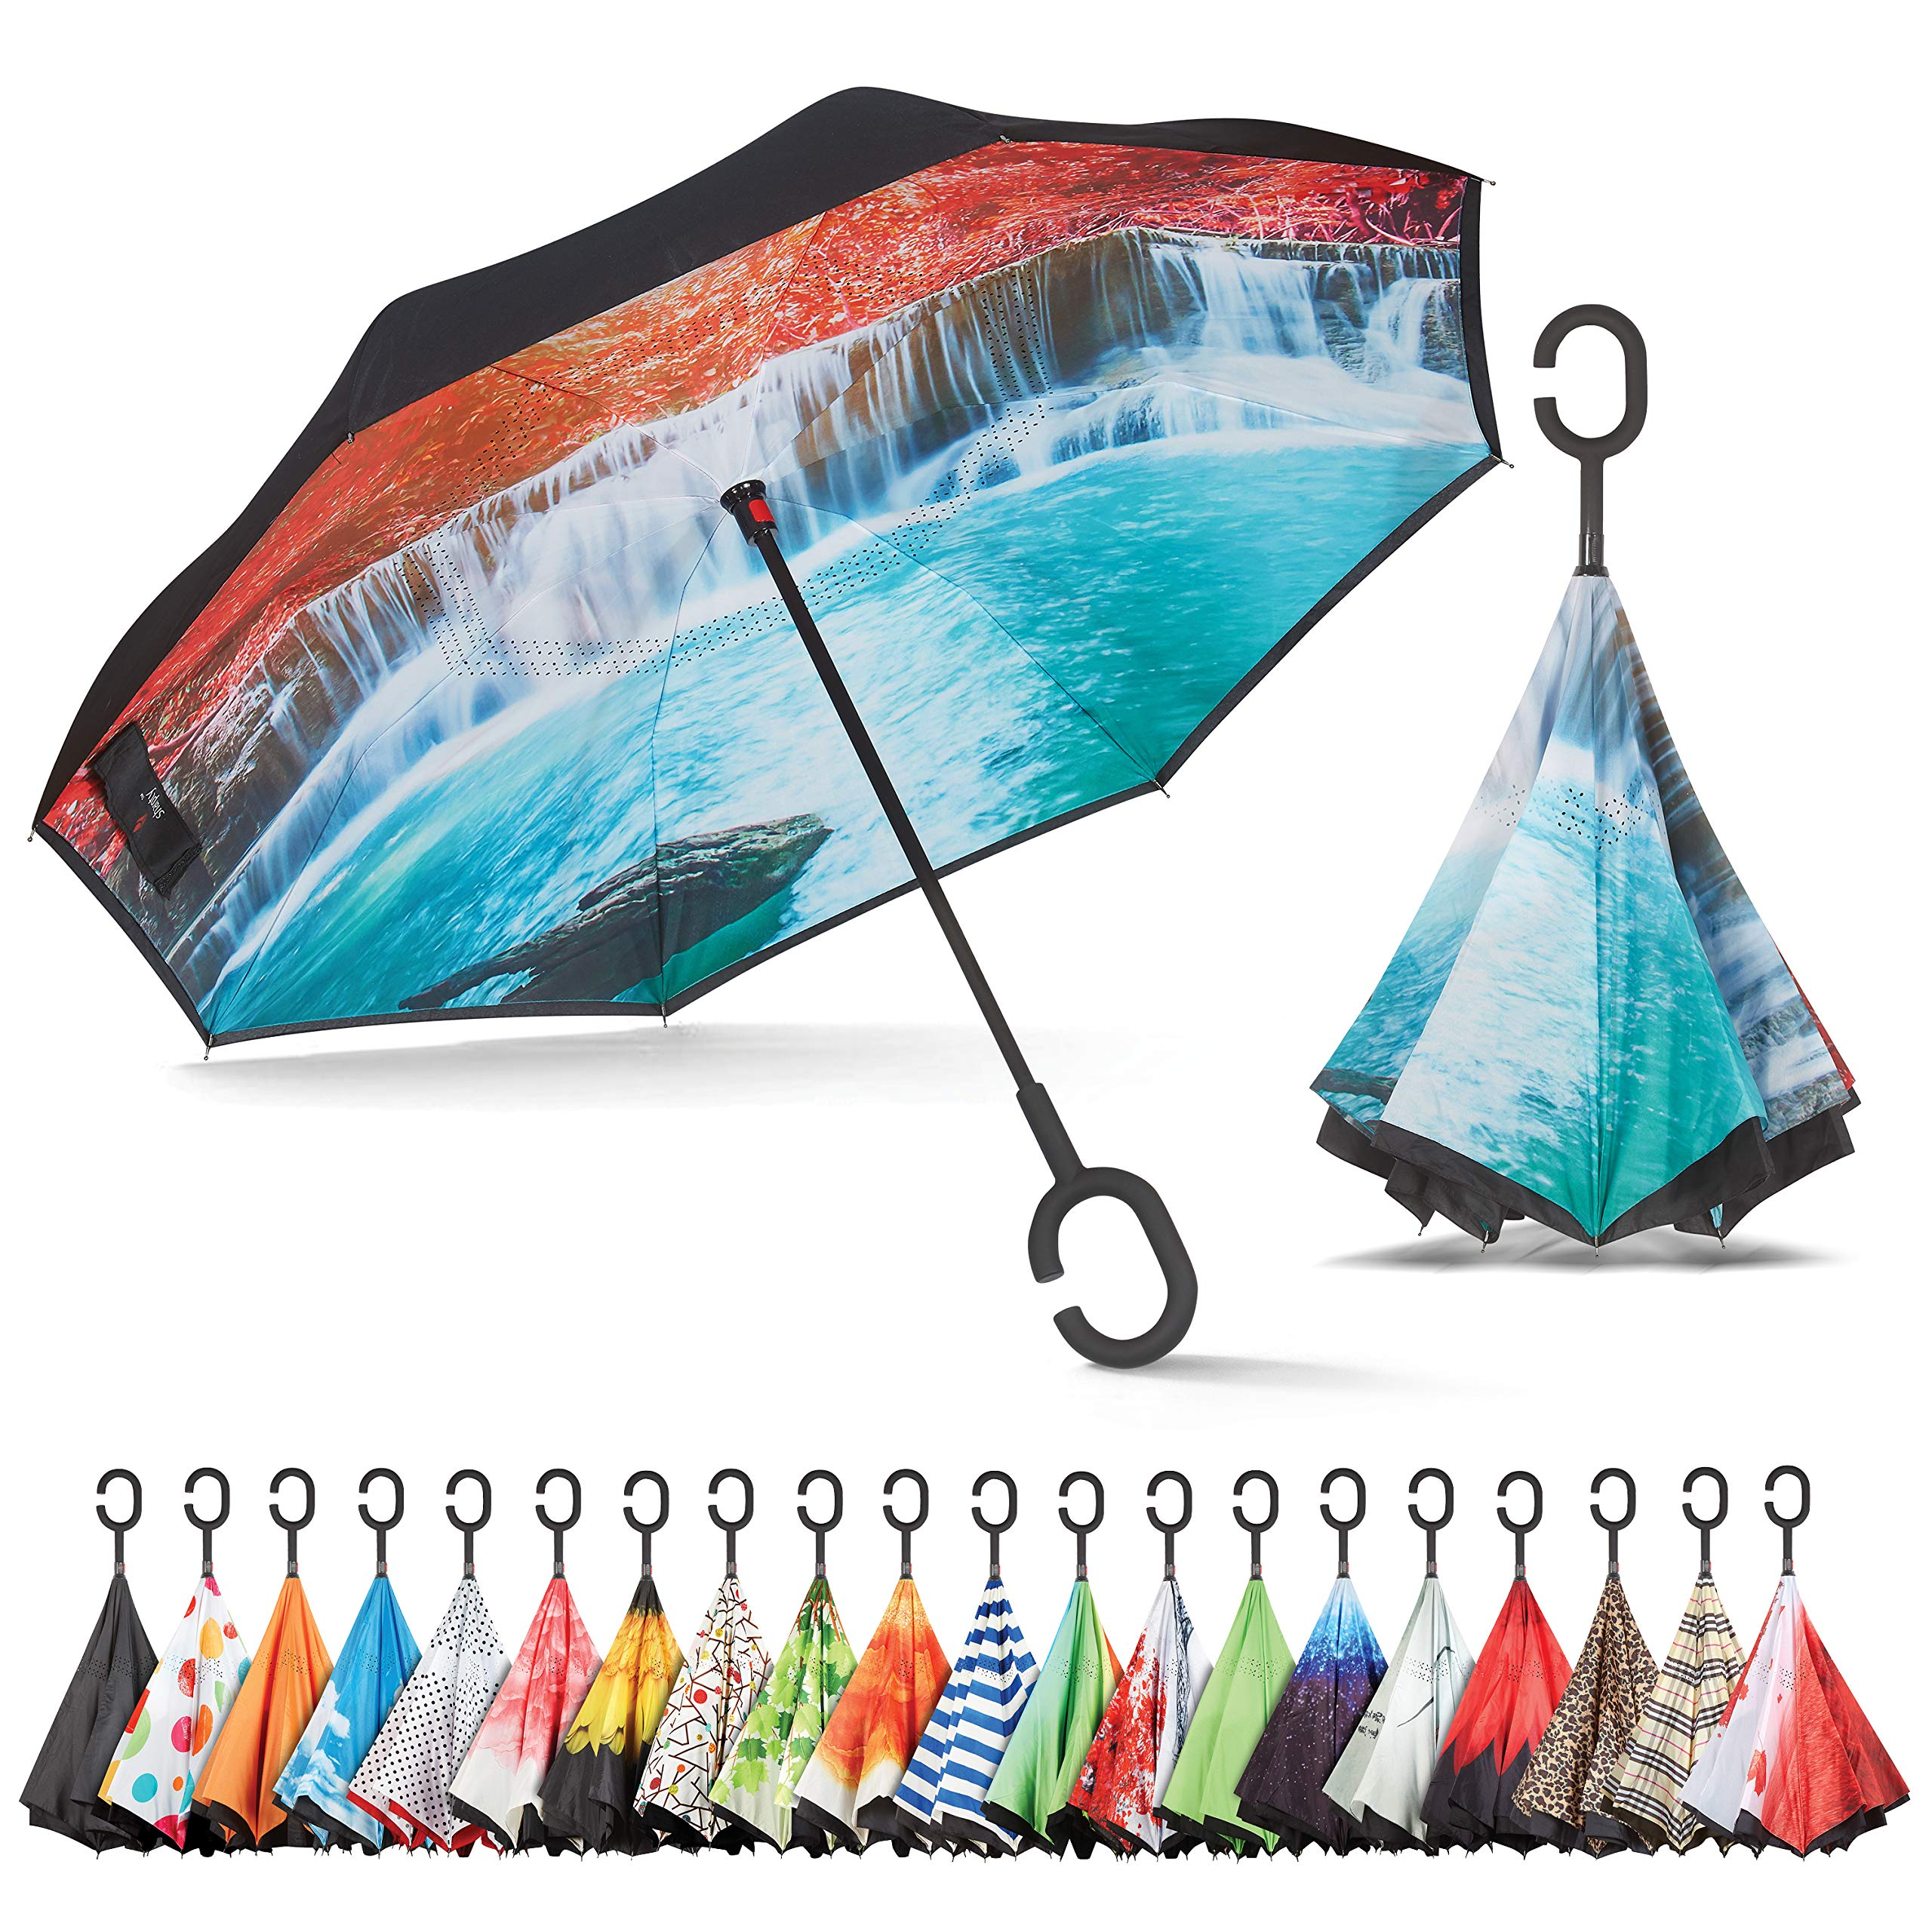 Sharpty Inverted Umbrella, Umbrella Windproof, Reverse Umbrella, Umbrellas for Women with UV Protection, Upside Down Umbrella with C-Shaped Handle (Waterfall)